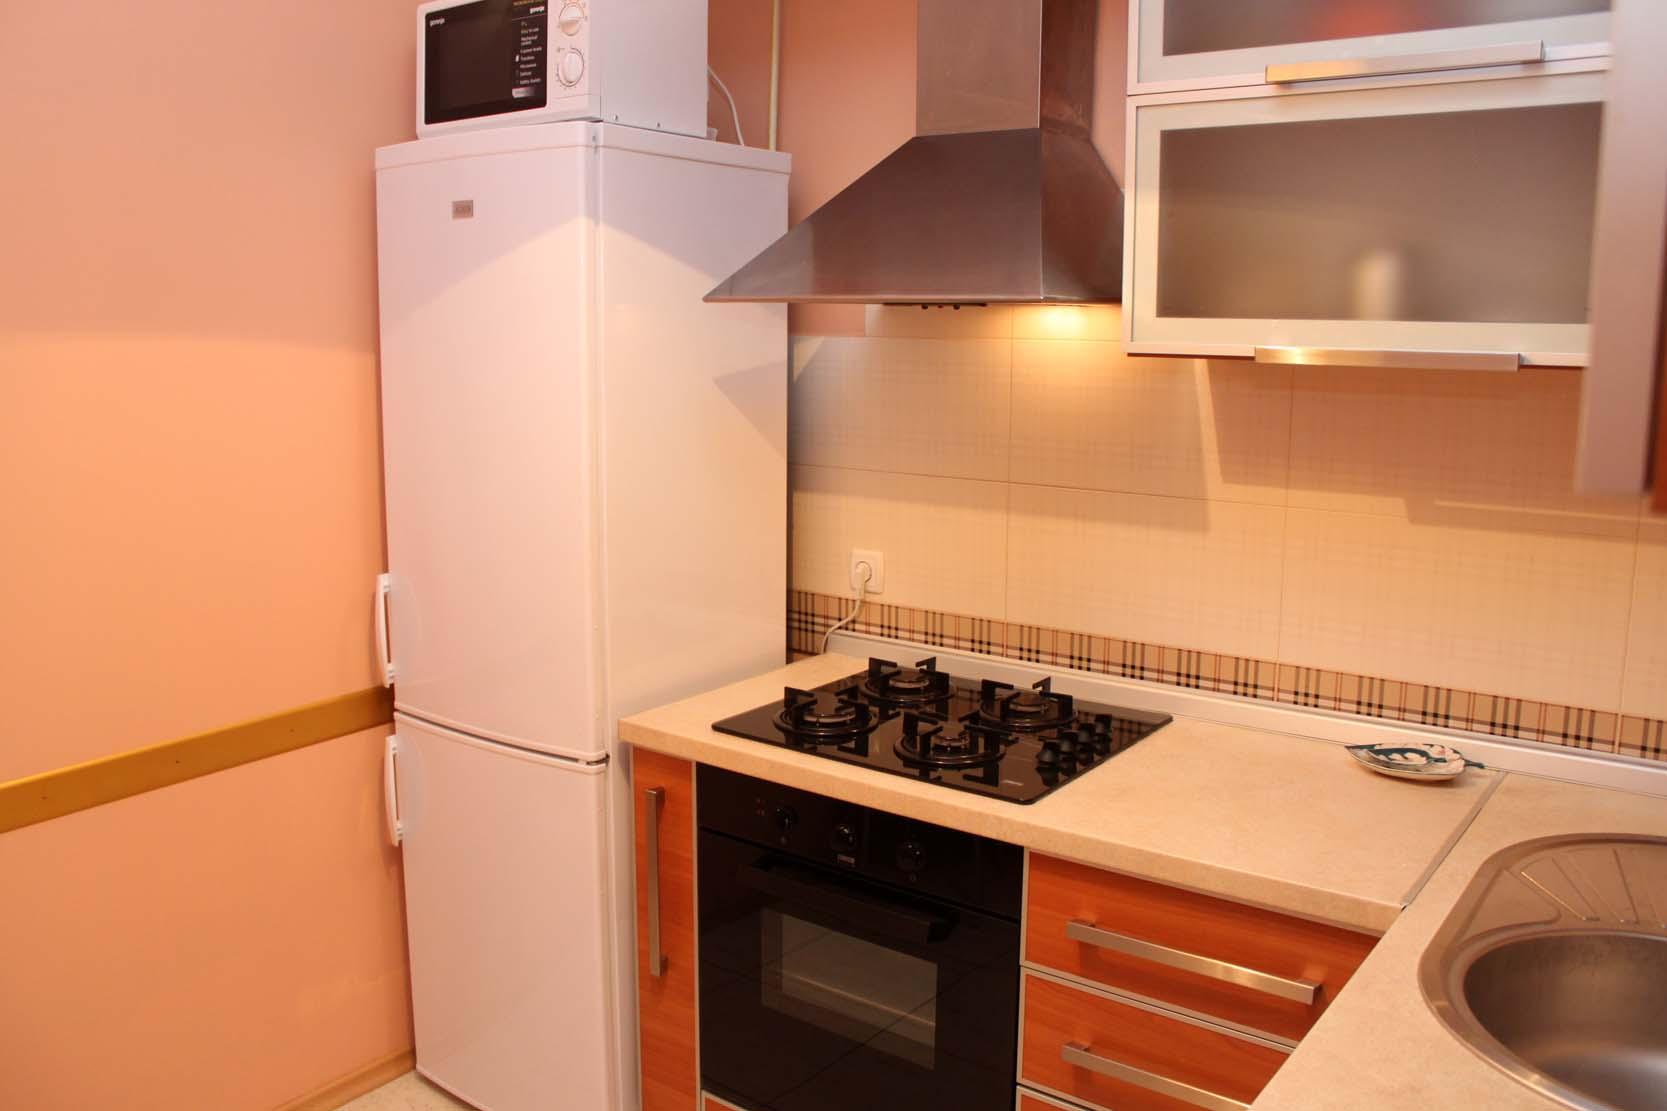 Ремонт кухни 6 кв.м своими руками фото